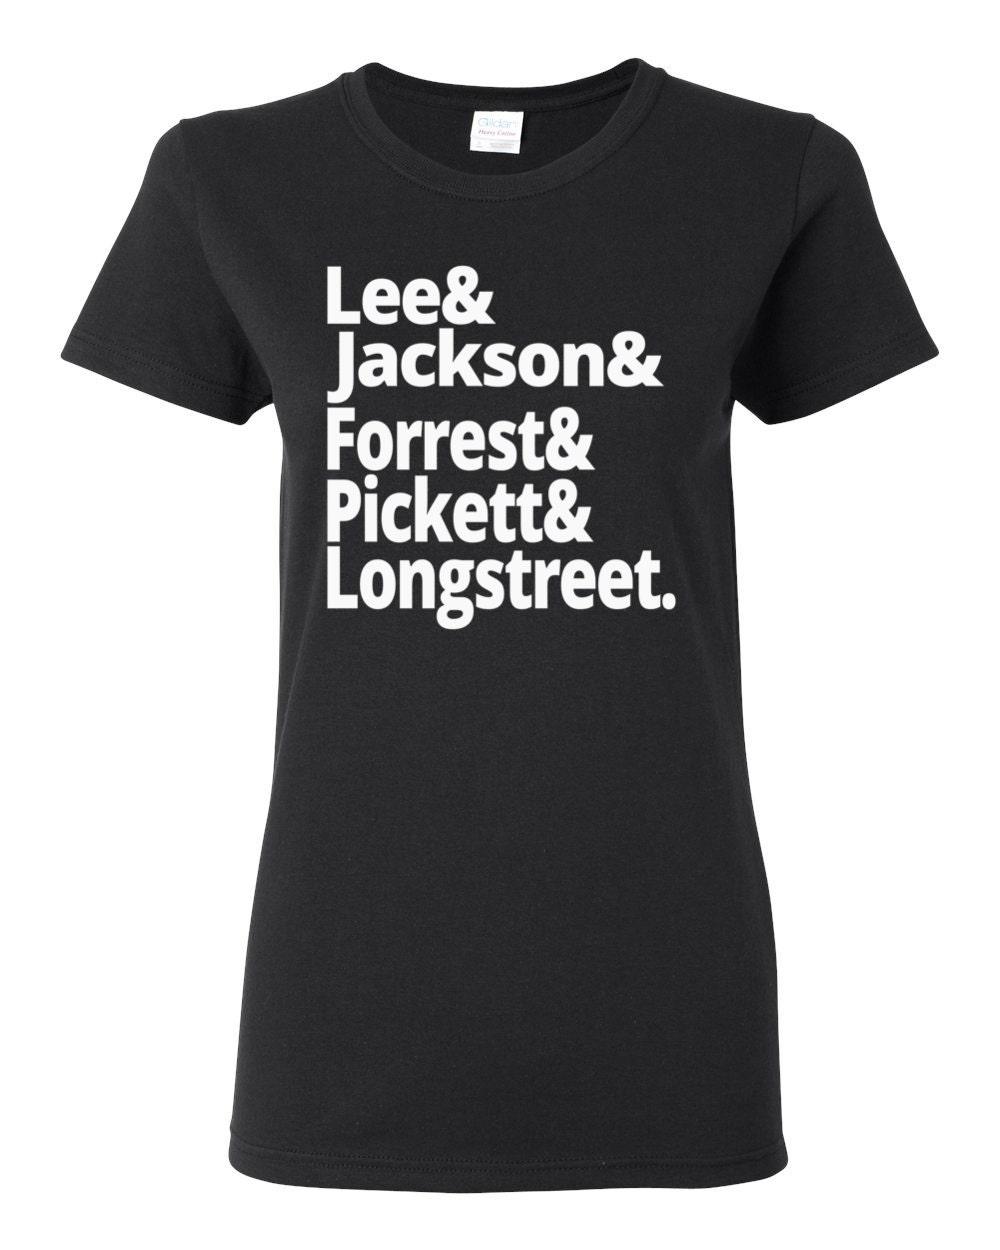 US Civil War - Confederate Generals - Lee, Jackson, Forrest, Pickett, Longstreet - Women's US Civil War History T-shirt